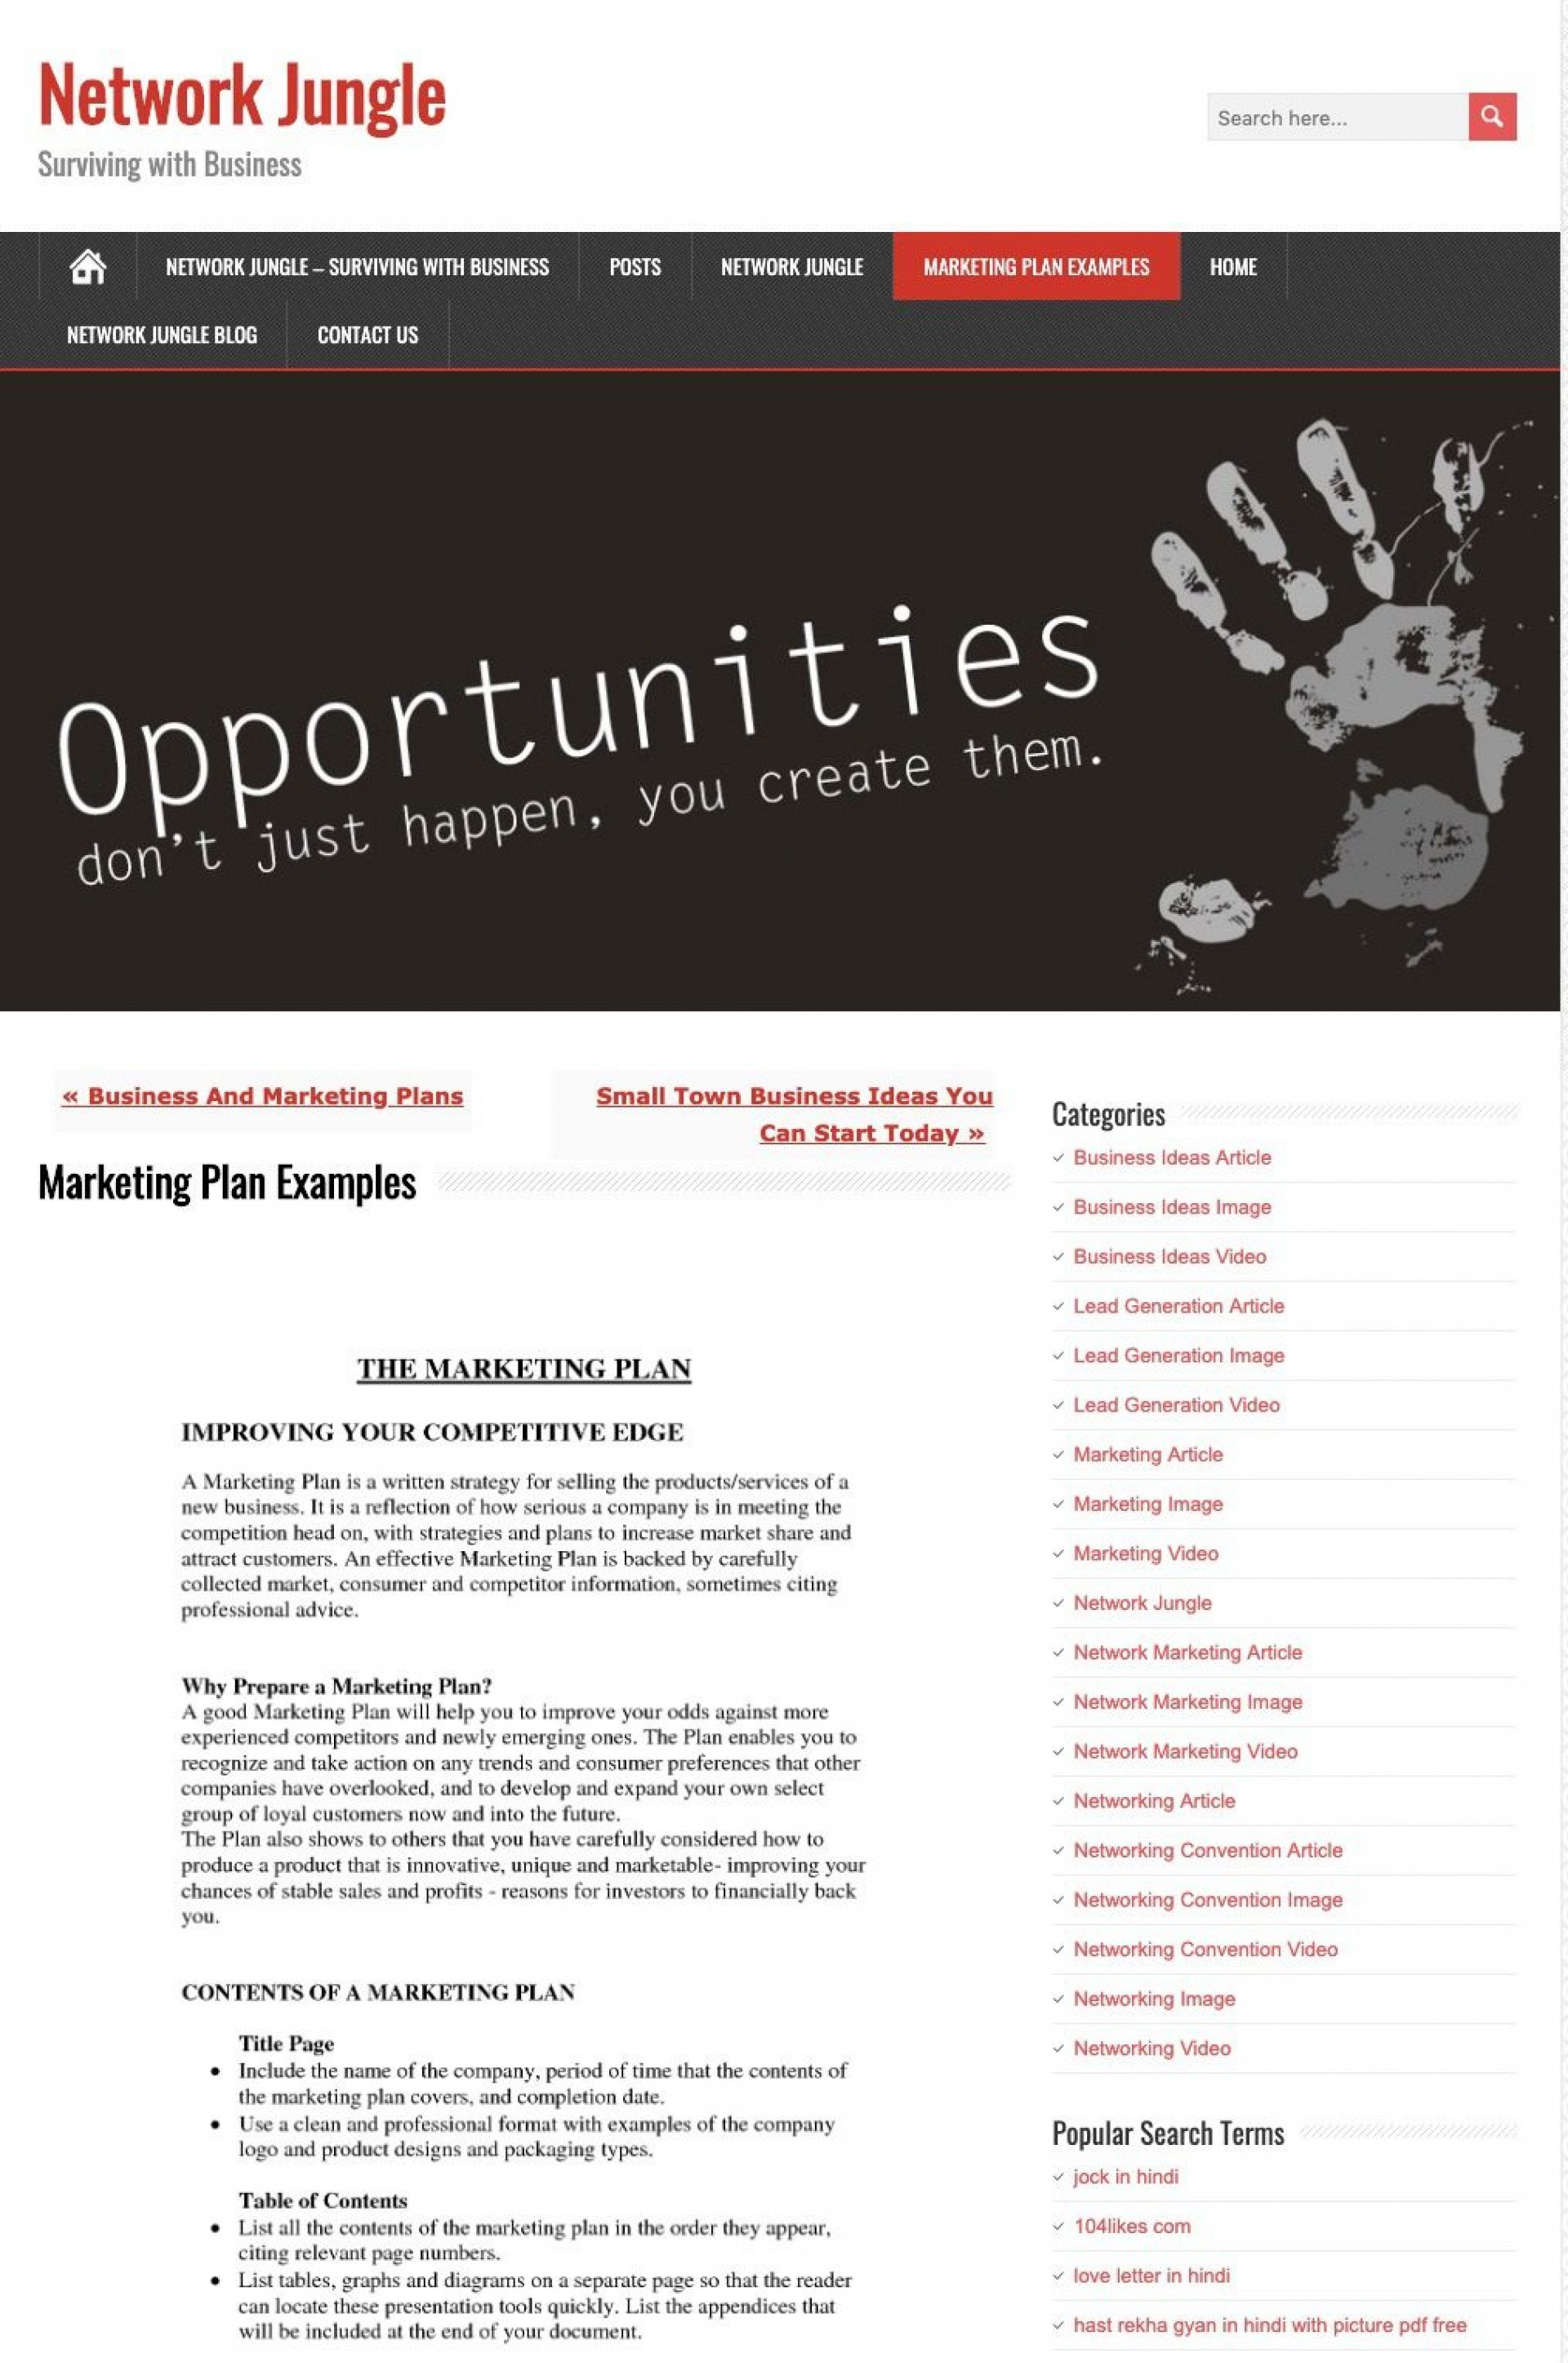 009 Sensational Digital Marketing Plan Example Pdf Image  Free Template Busines Sample1920